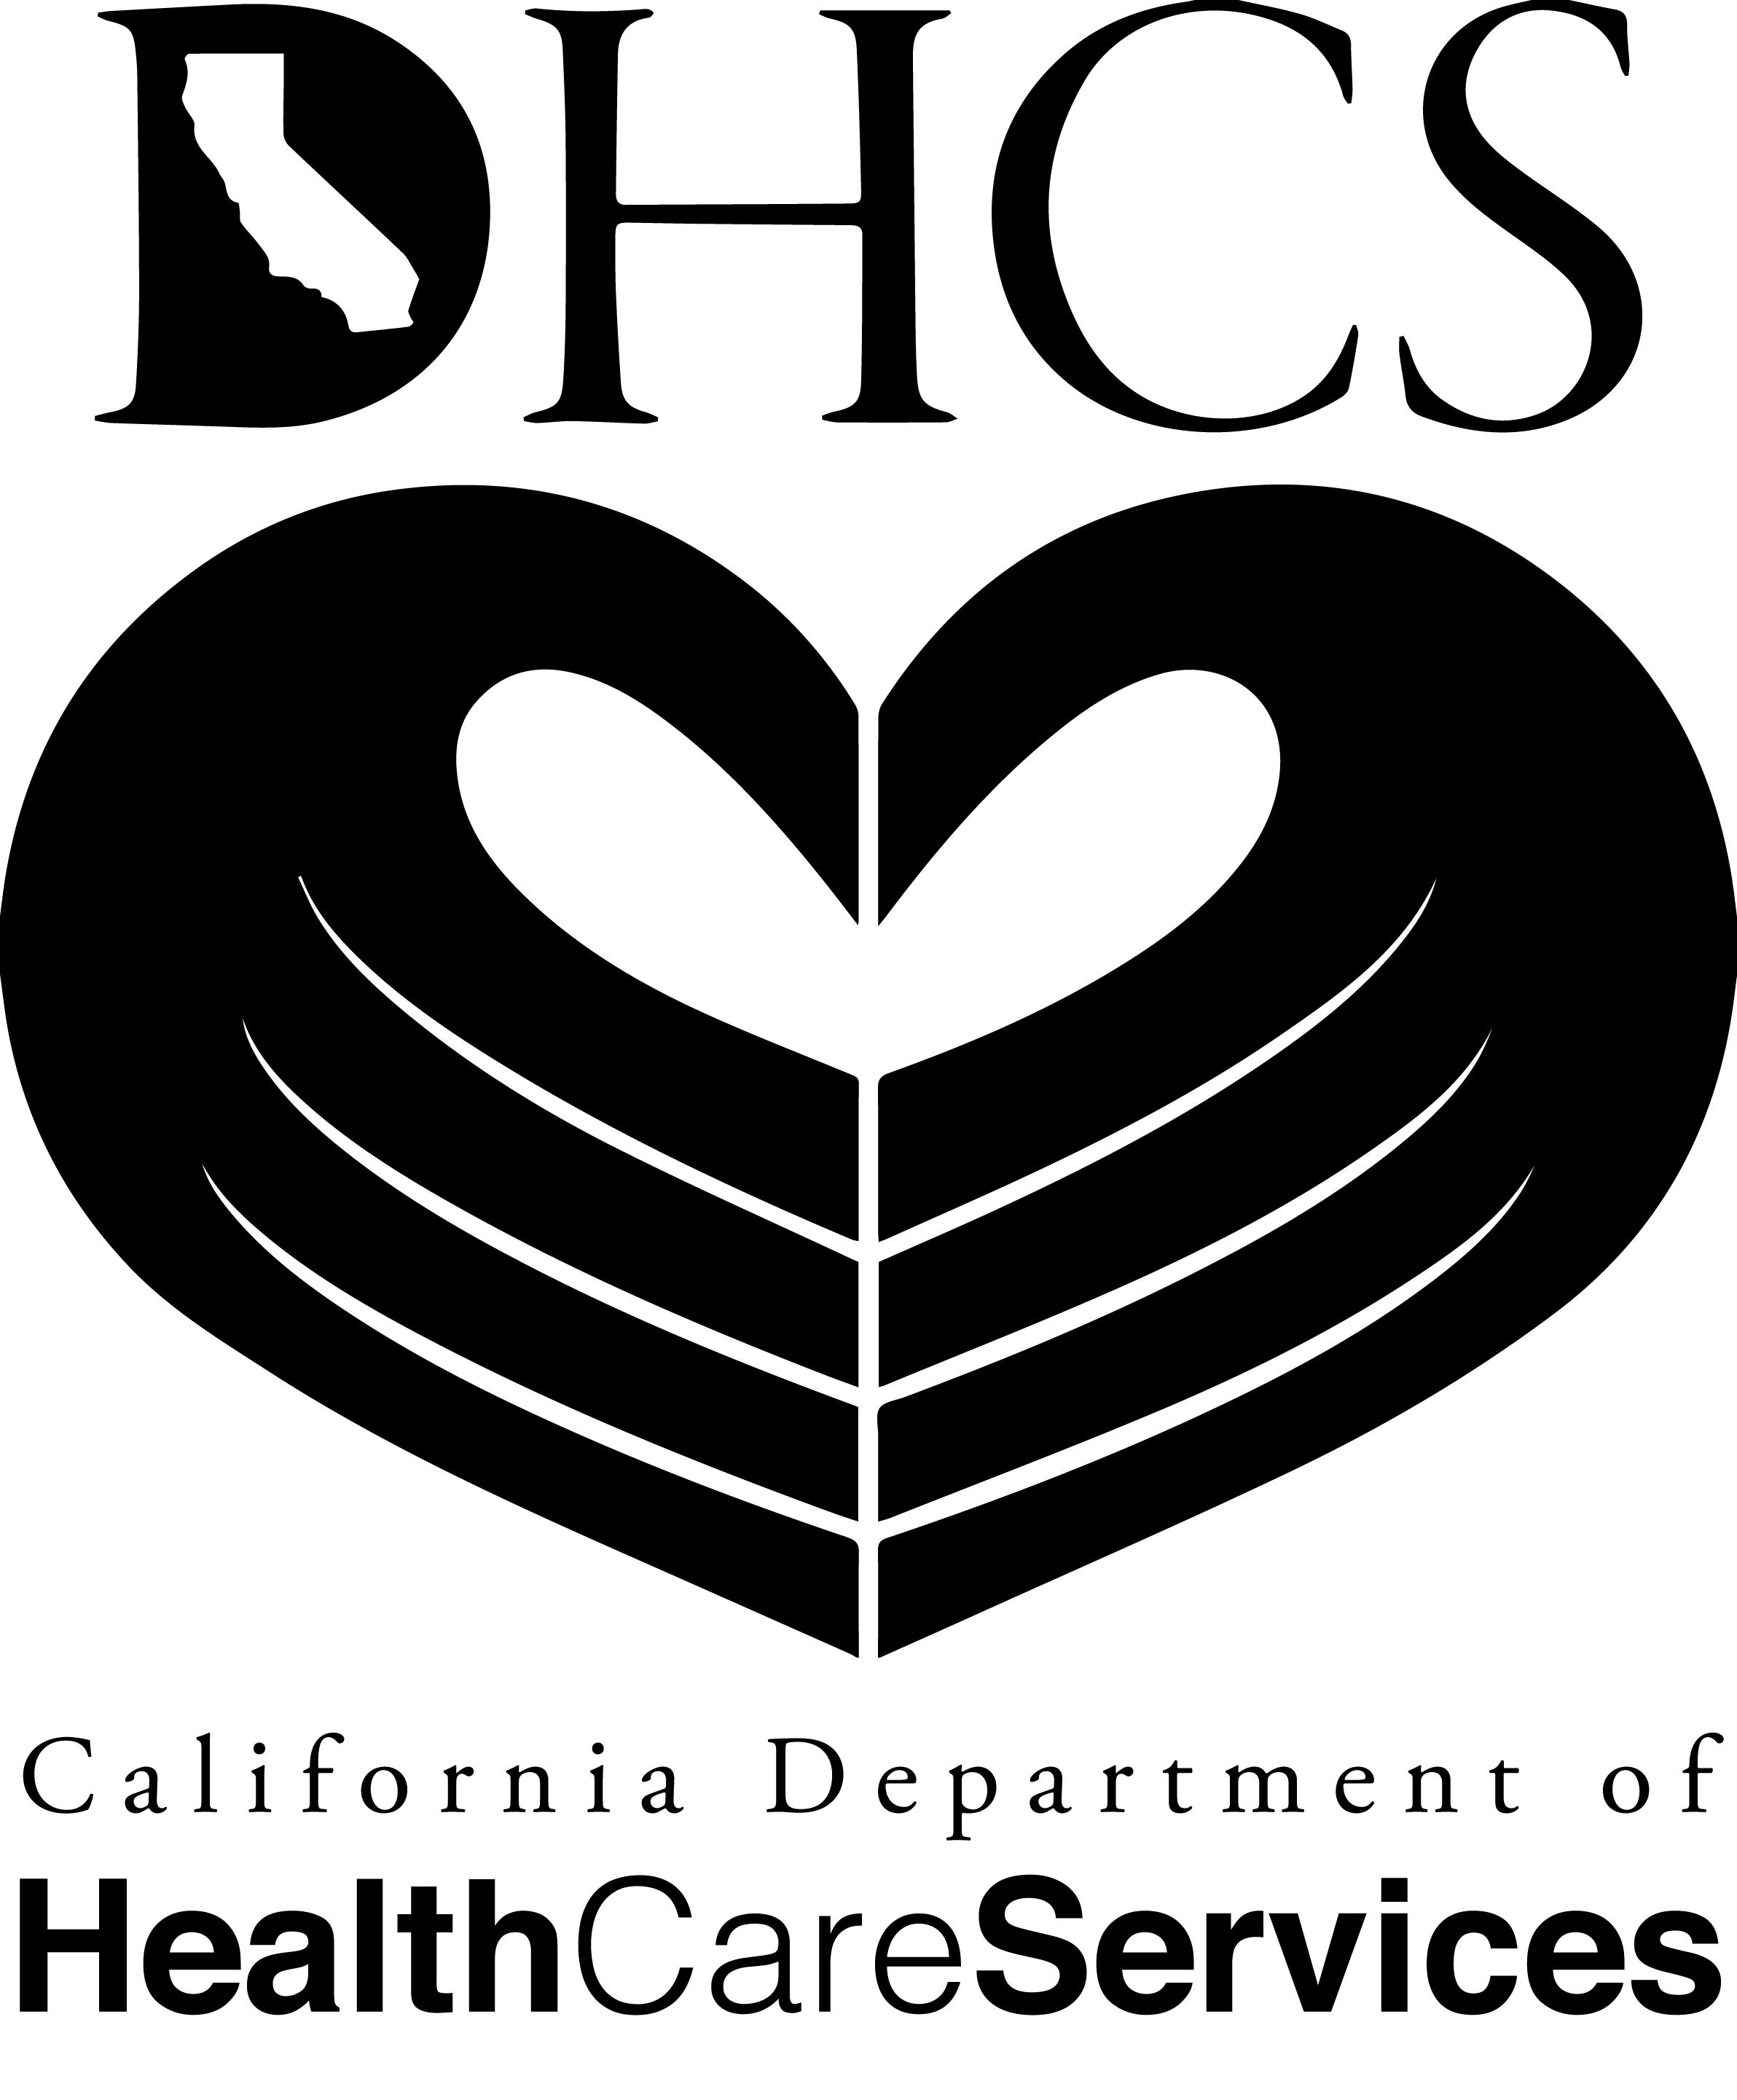 DHCS_bw.jpg